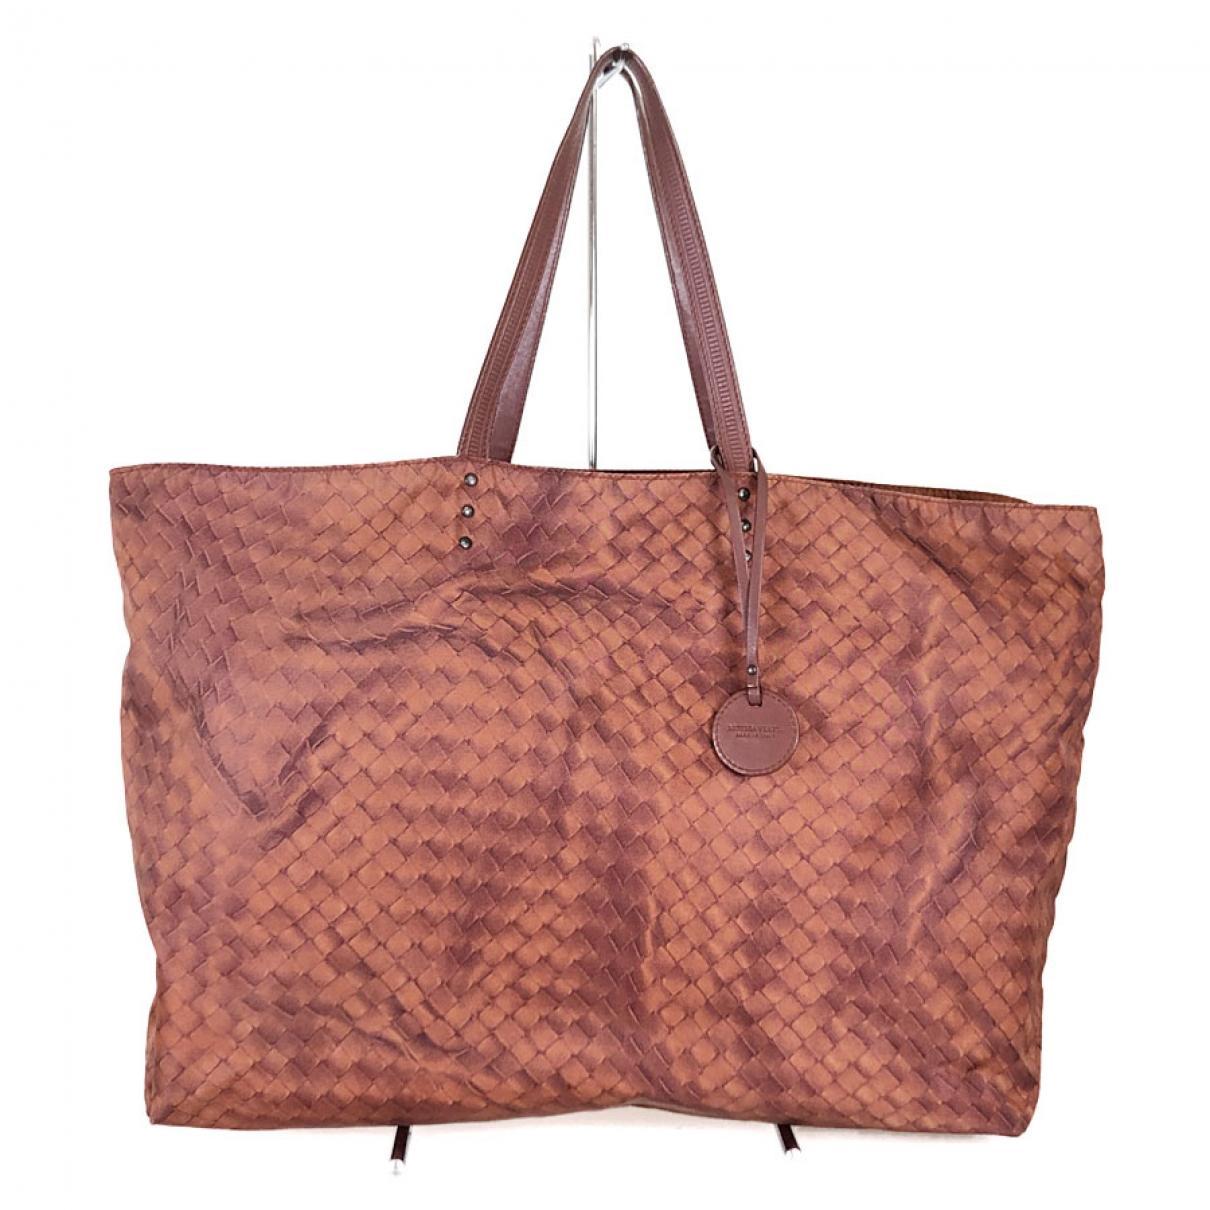 Bottega Veneta \N Brown Cloth handbag for Women \N